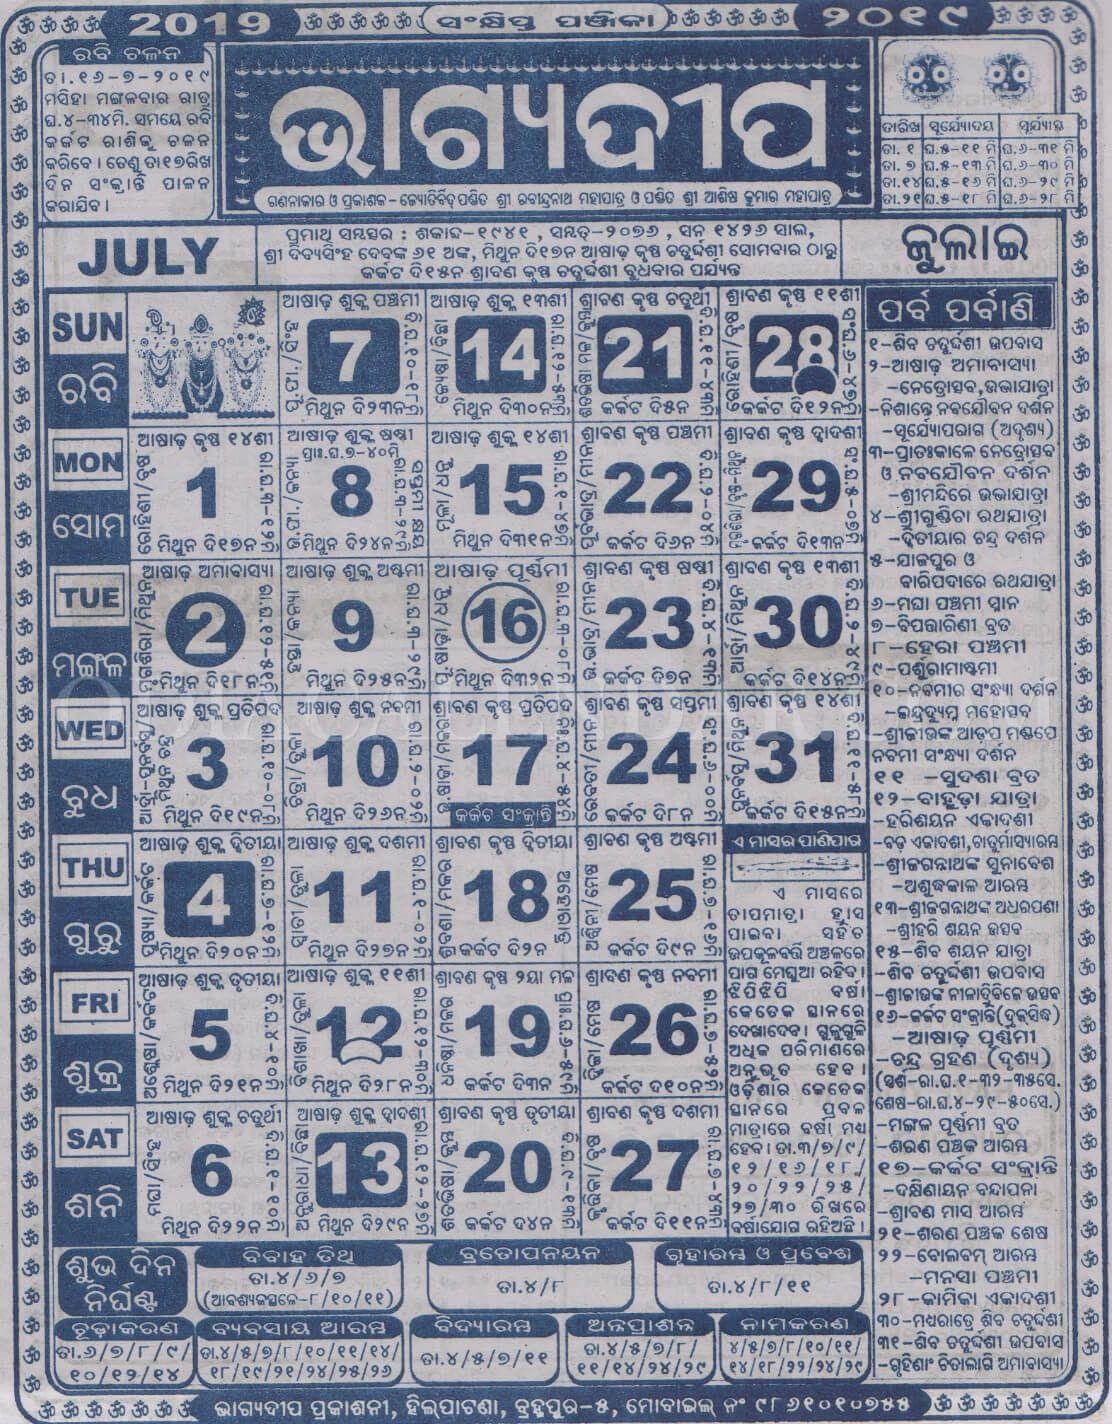 Bhagyadeep Calendar July 2019 | Calendar, Calendar App regarding Bhagyadeep Odia Calendar 2020